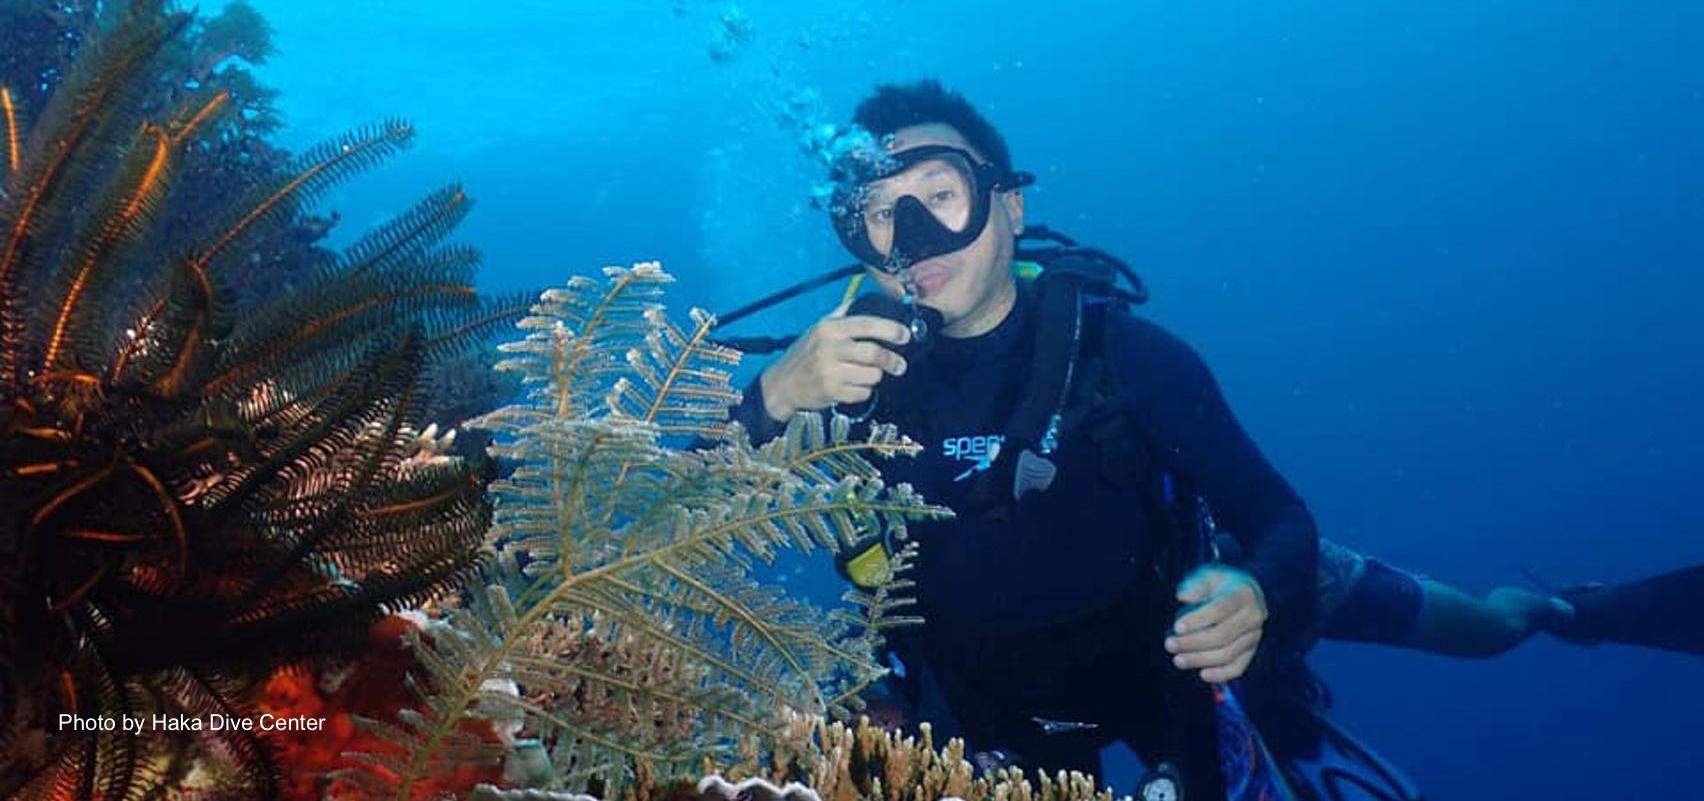 Bohol Pamilacan Fun Diving in Pamilacan Sanctuary, Dakit Dakit & Spanish Tower